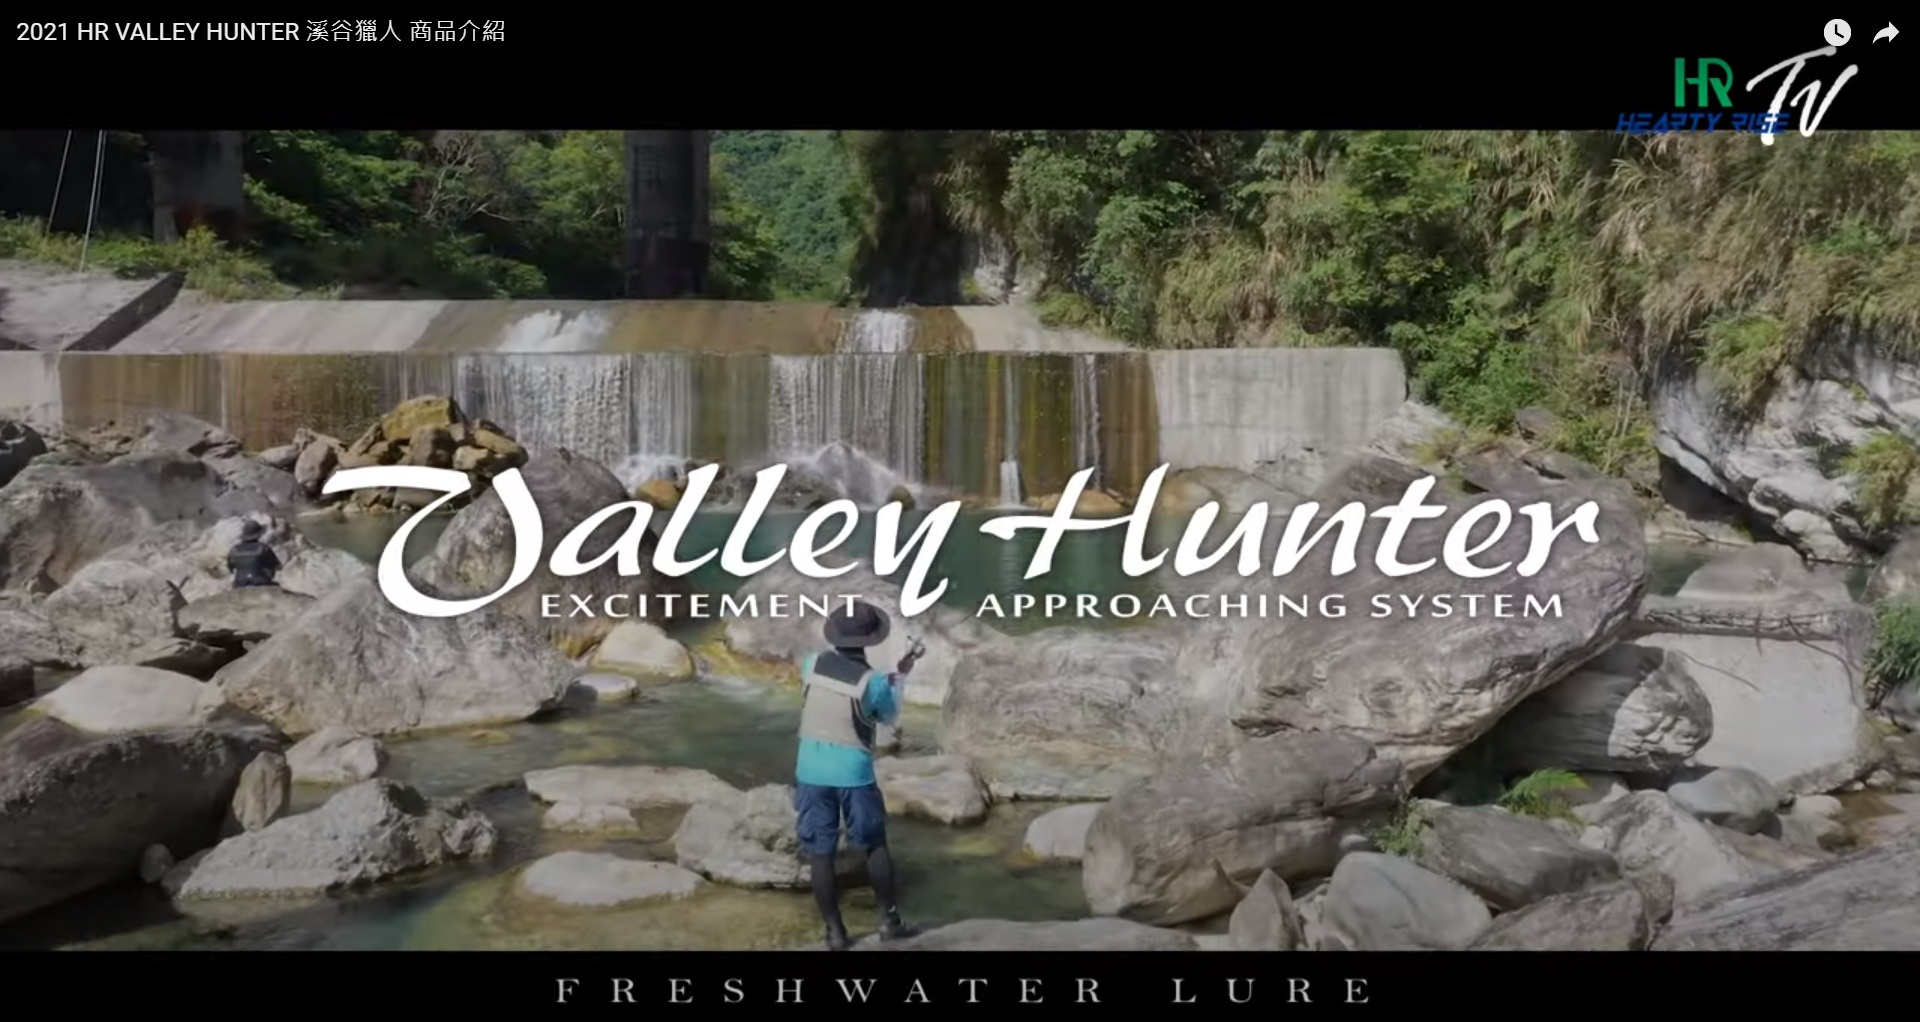 2021 HR VALLEY HUNTER 溪谷獵人 商品介紹